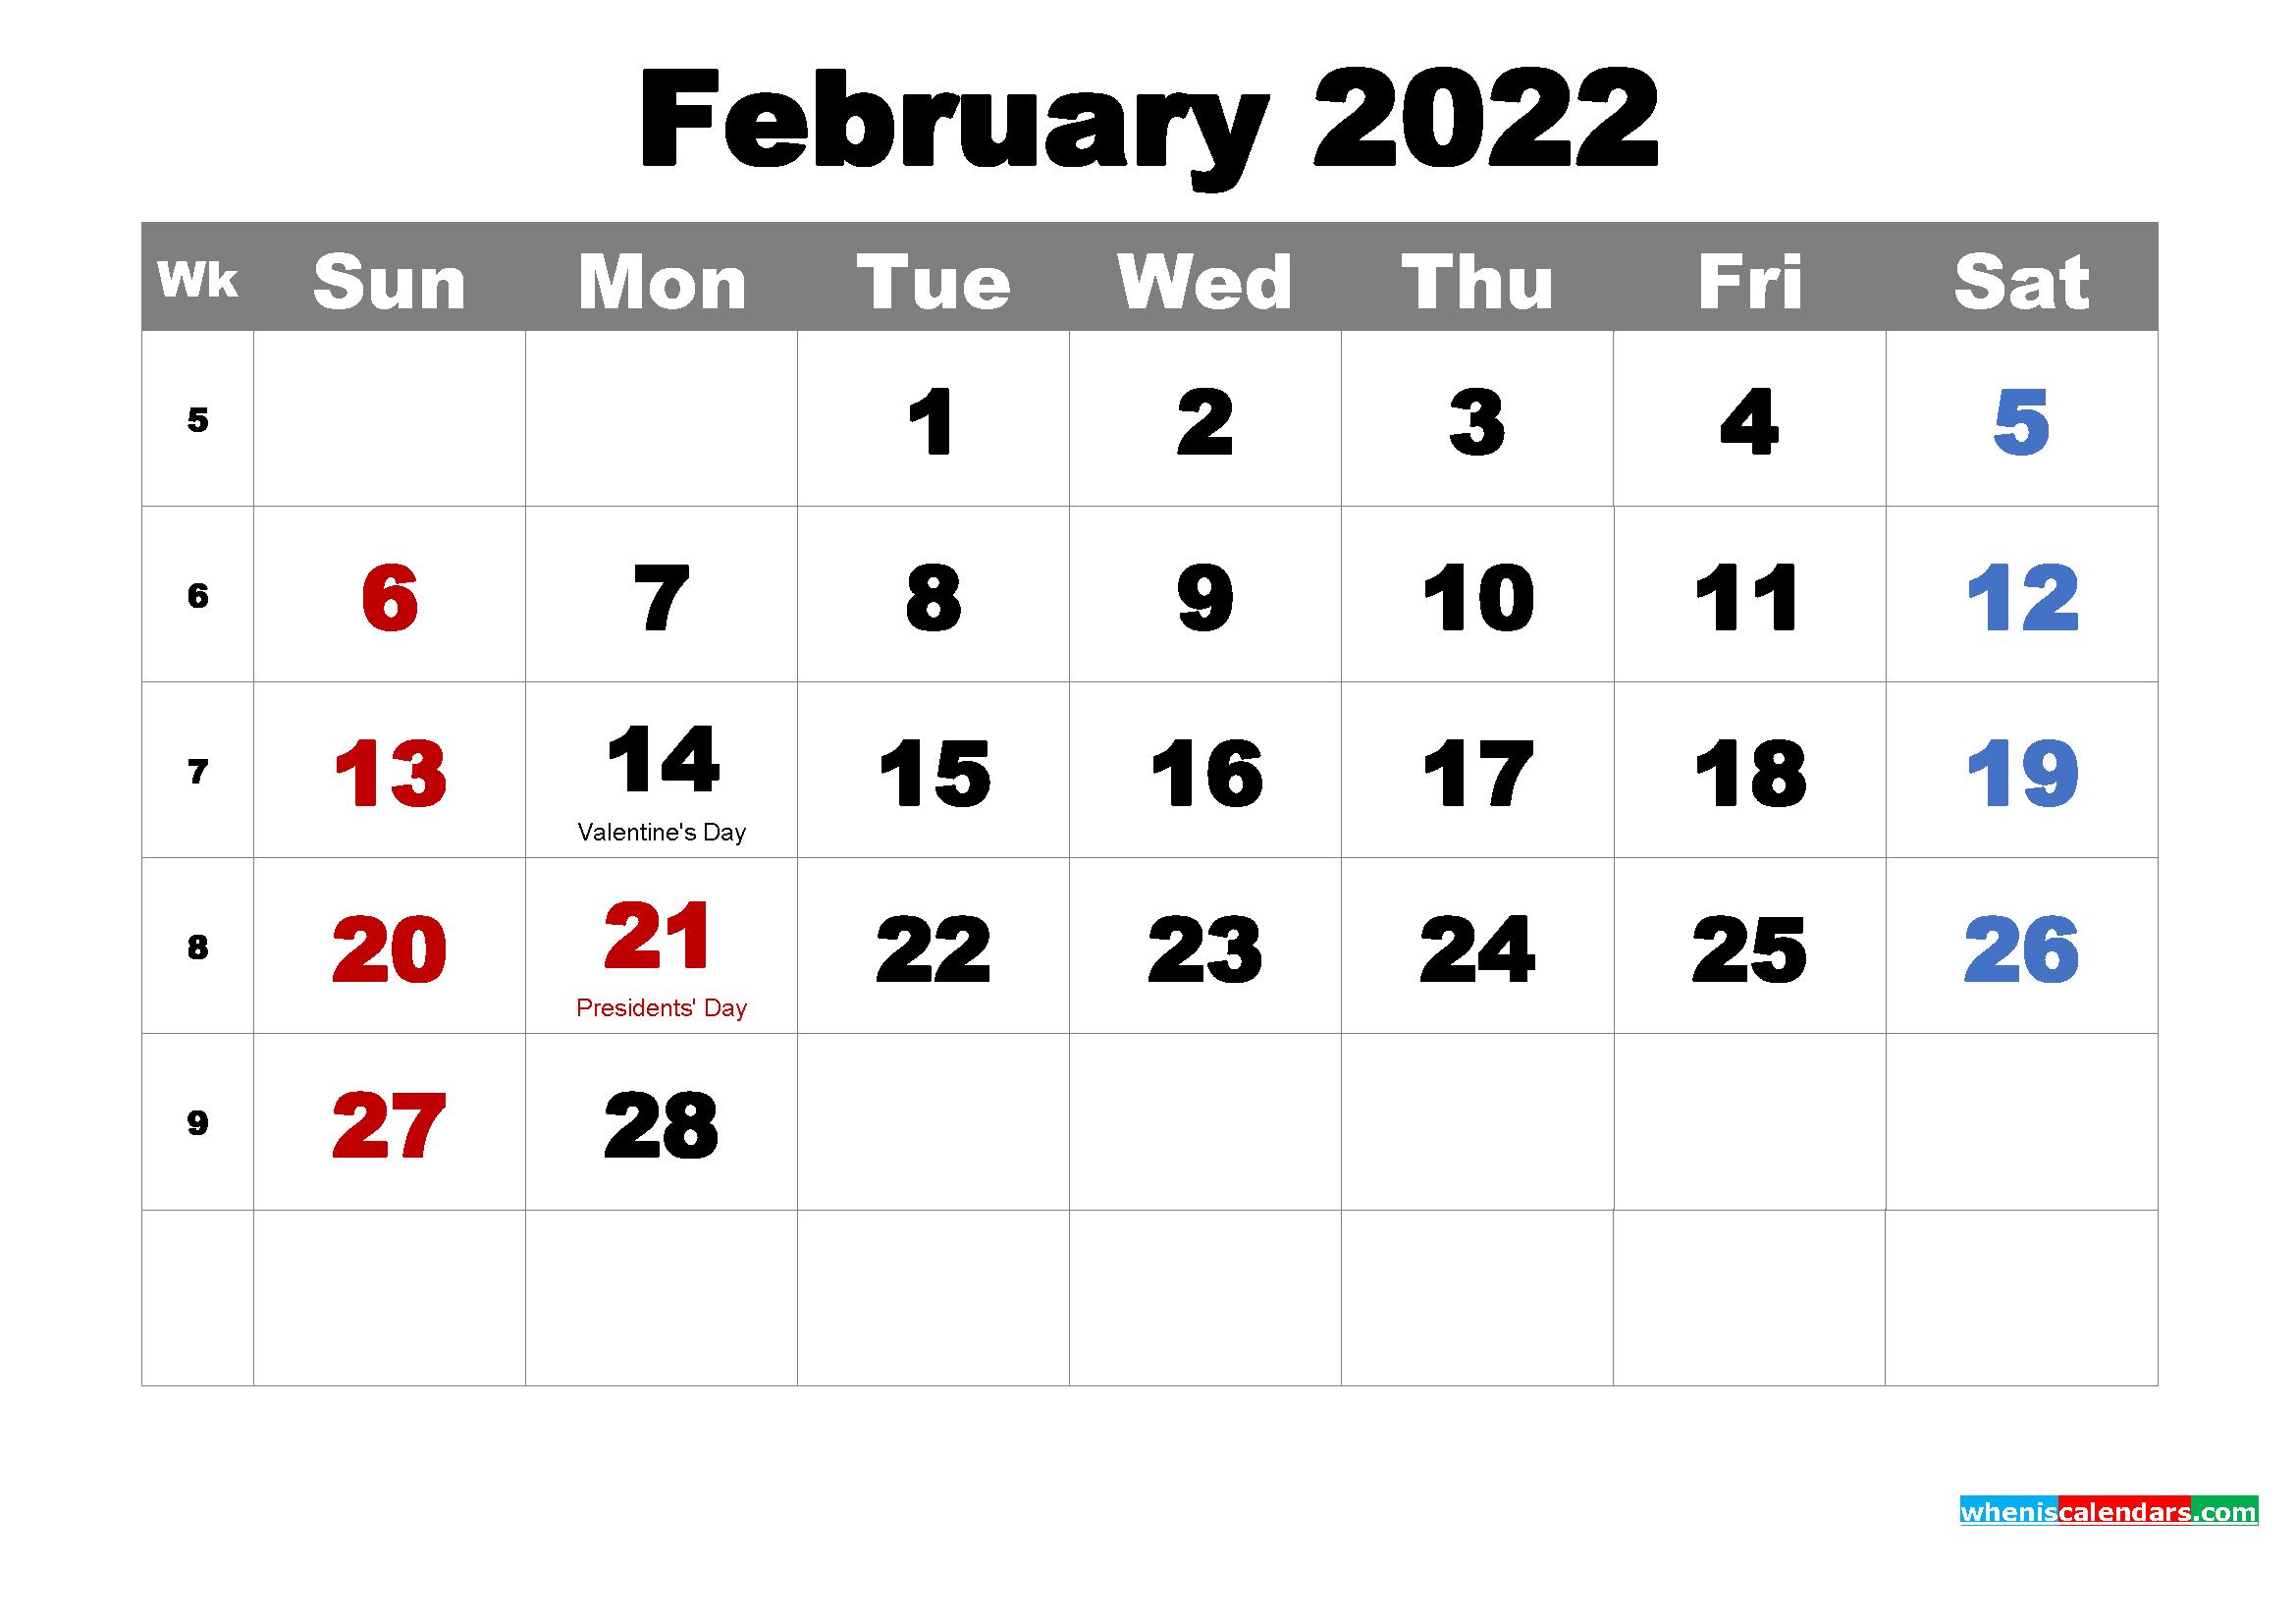 Free Printable February 2022 Calendar With Holidays As In Free Printable Calendar For February 2022